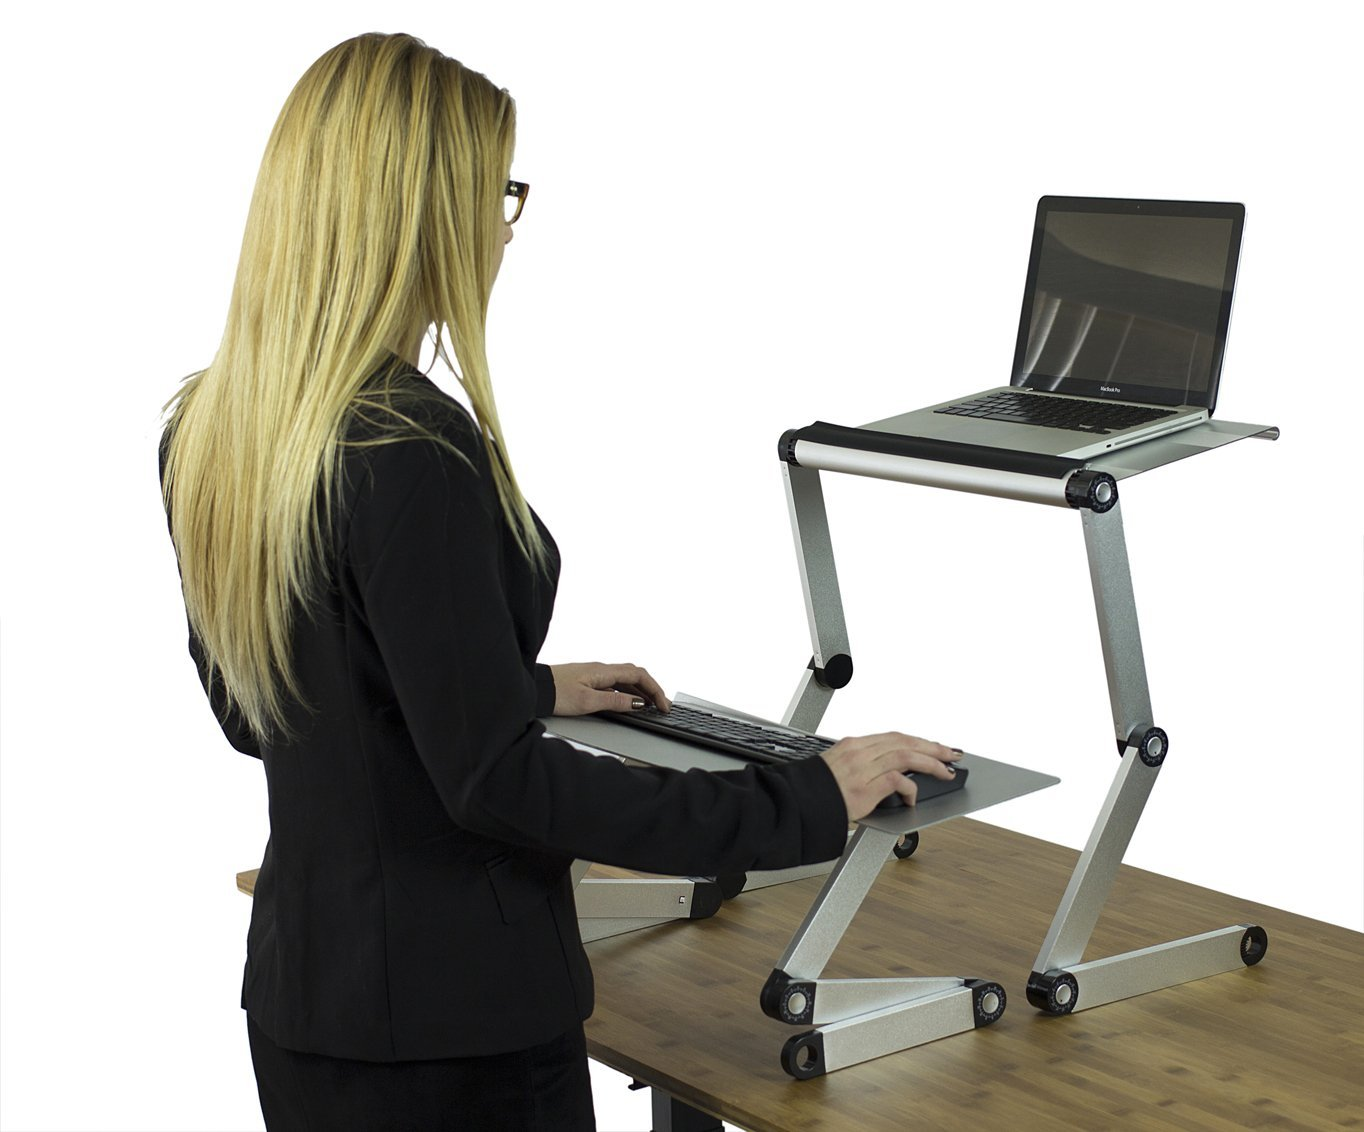 WorkEZ Standing Desk Conversion Kit. Affordable Adjustable Height & Angle Sit to Stand Up Desktop Riser Converter with Negative Tilt Keyboard Tray